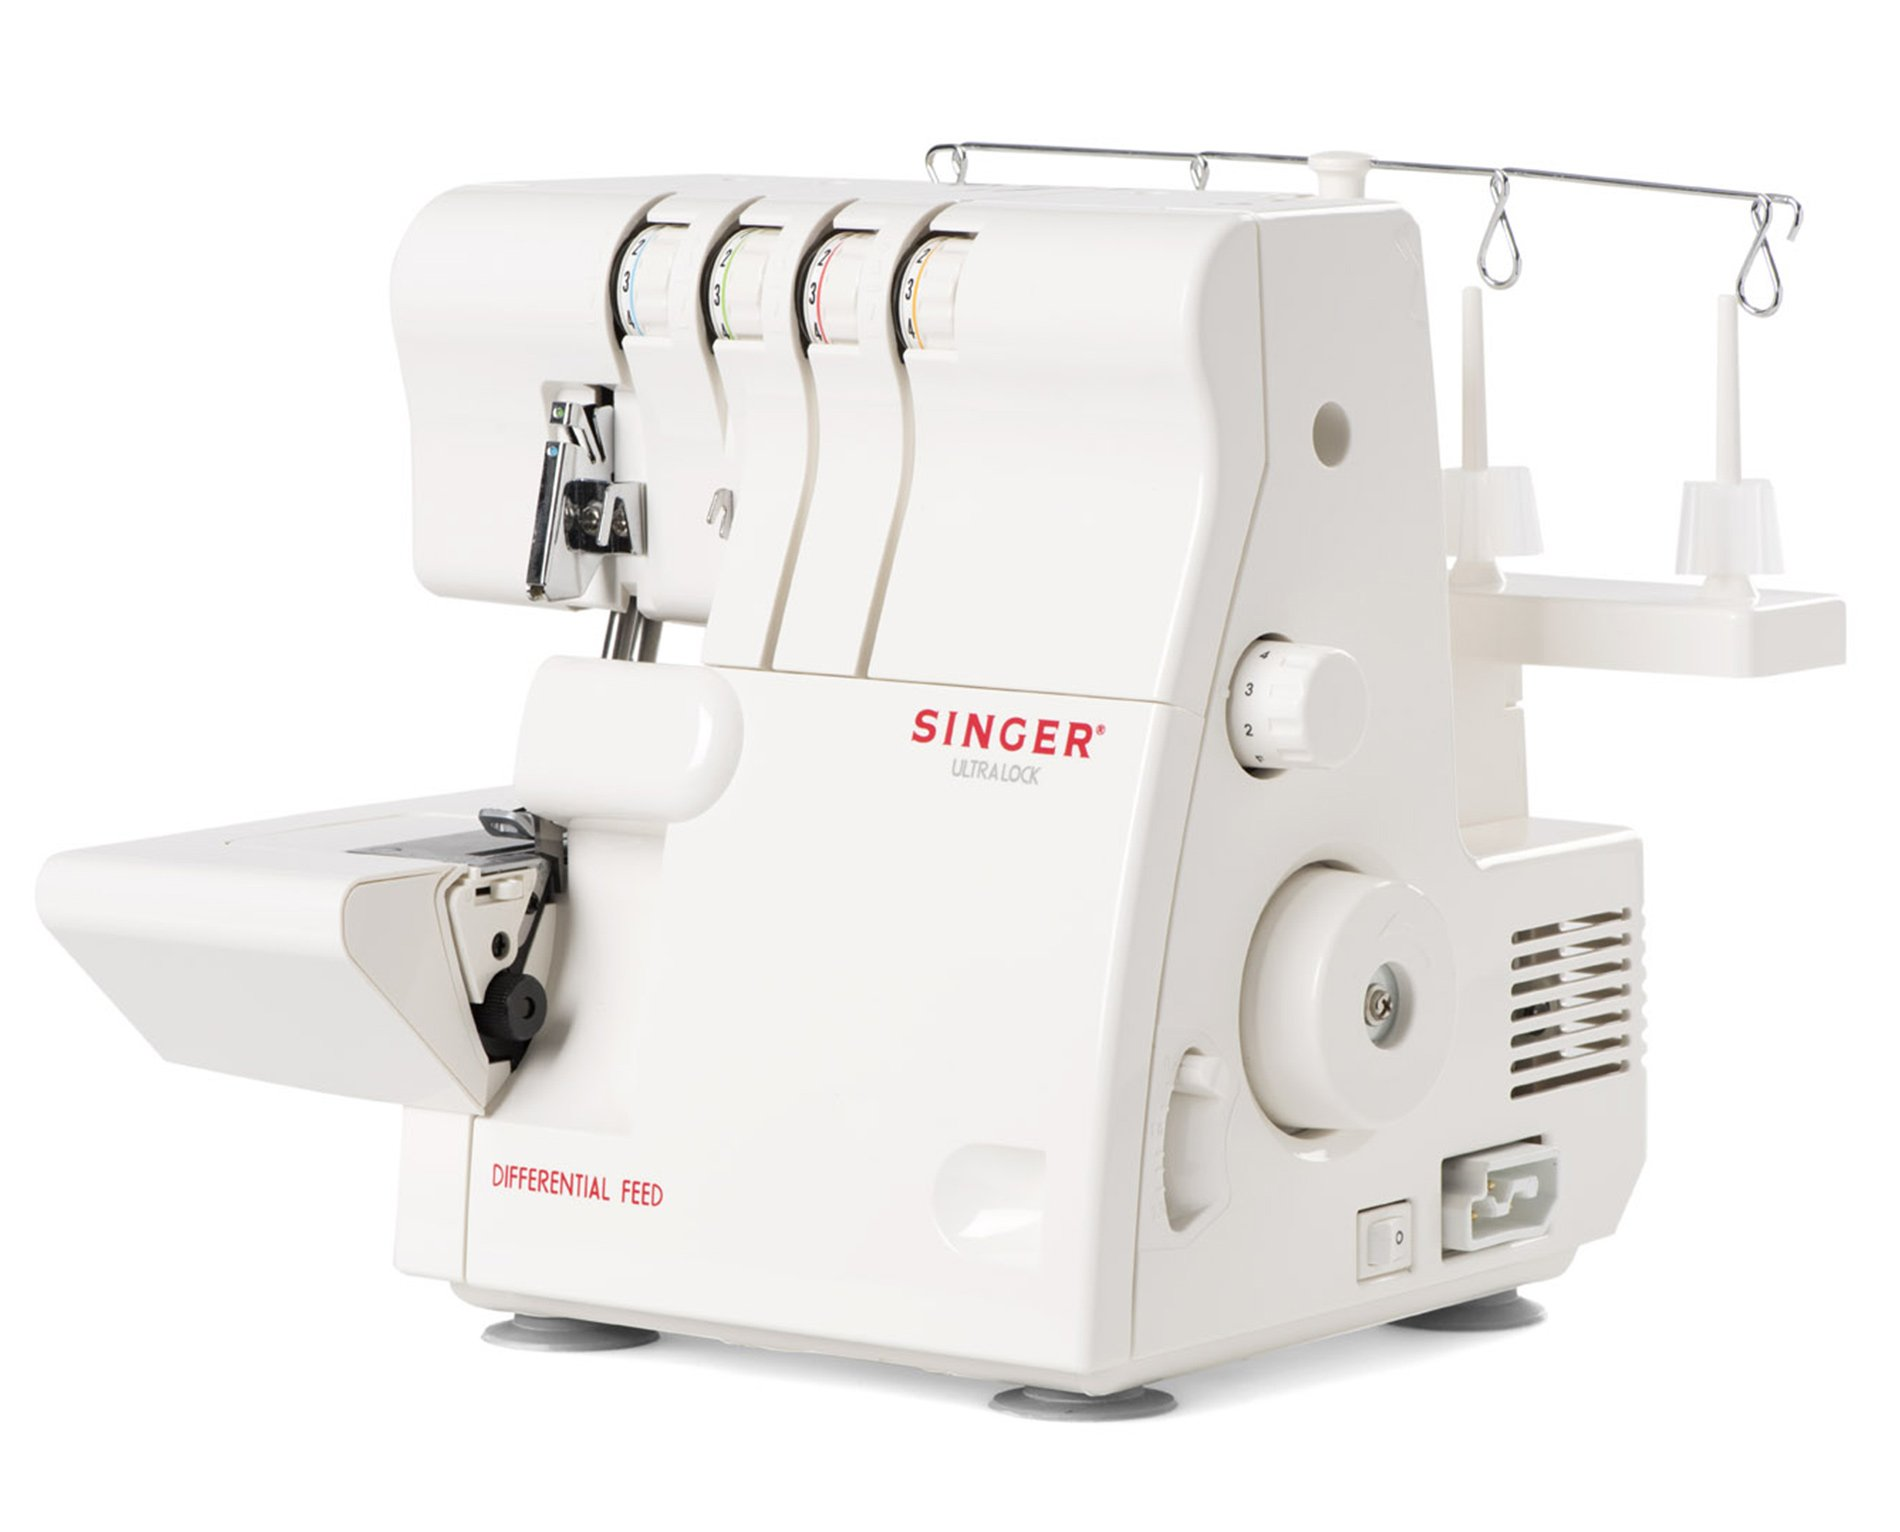 Surjeteuse Singer 14SH654 product image